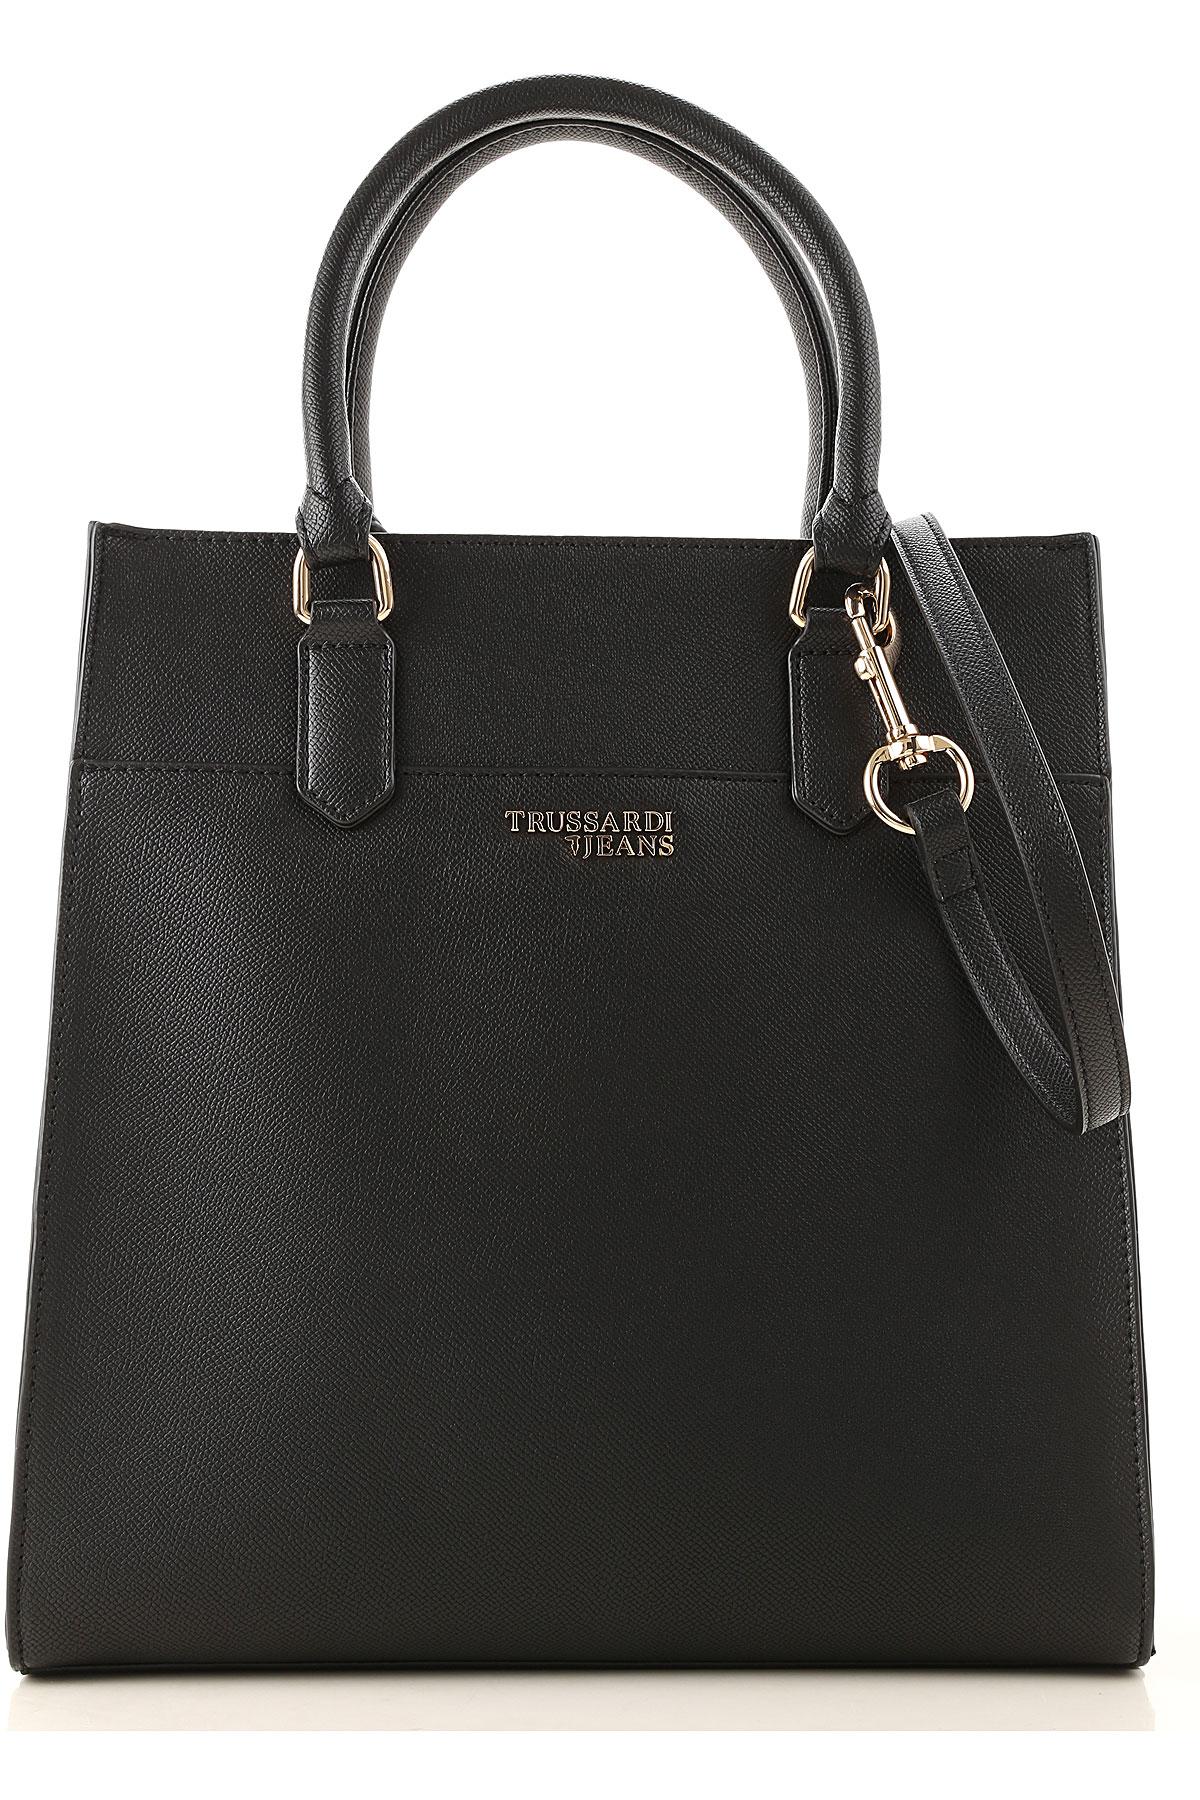 Trussardi Tote Bag On Sale, Black, Eco Leather, 2019